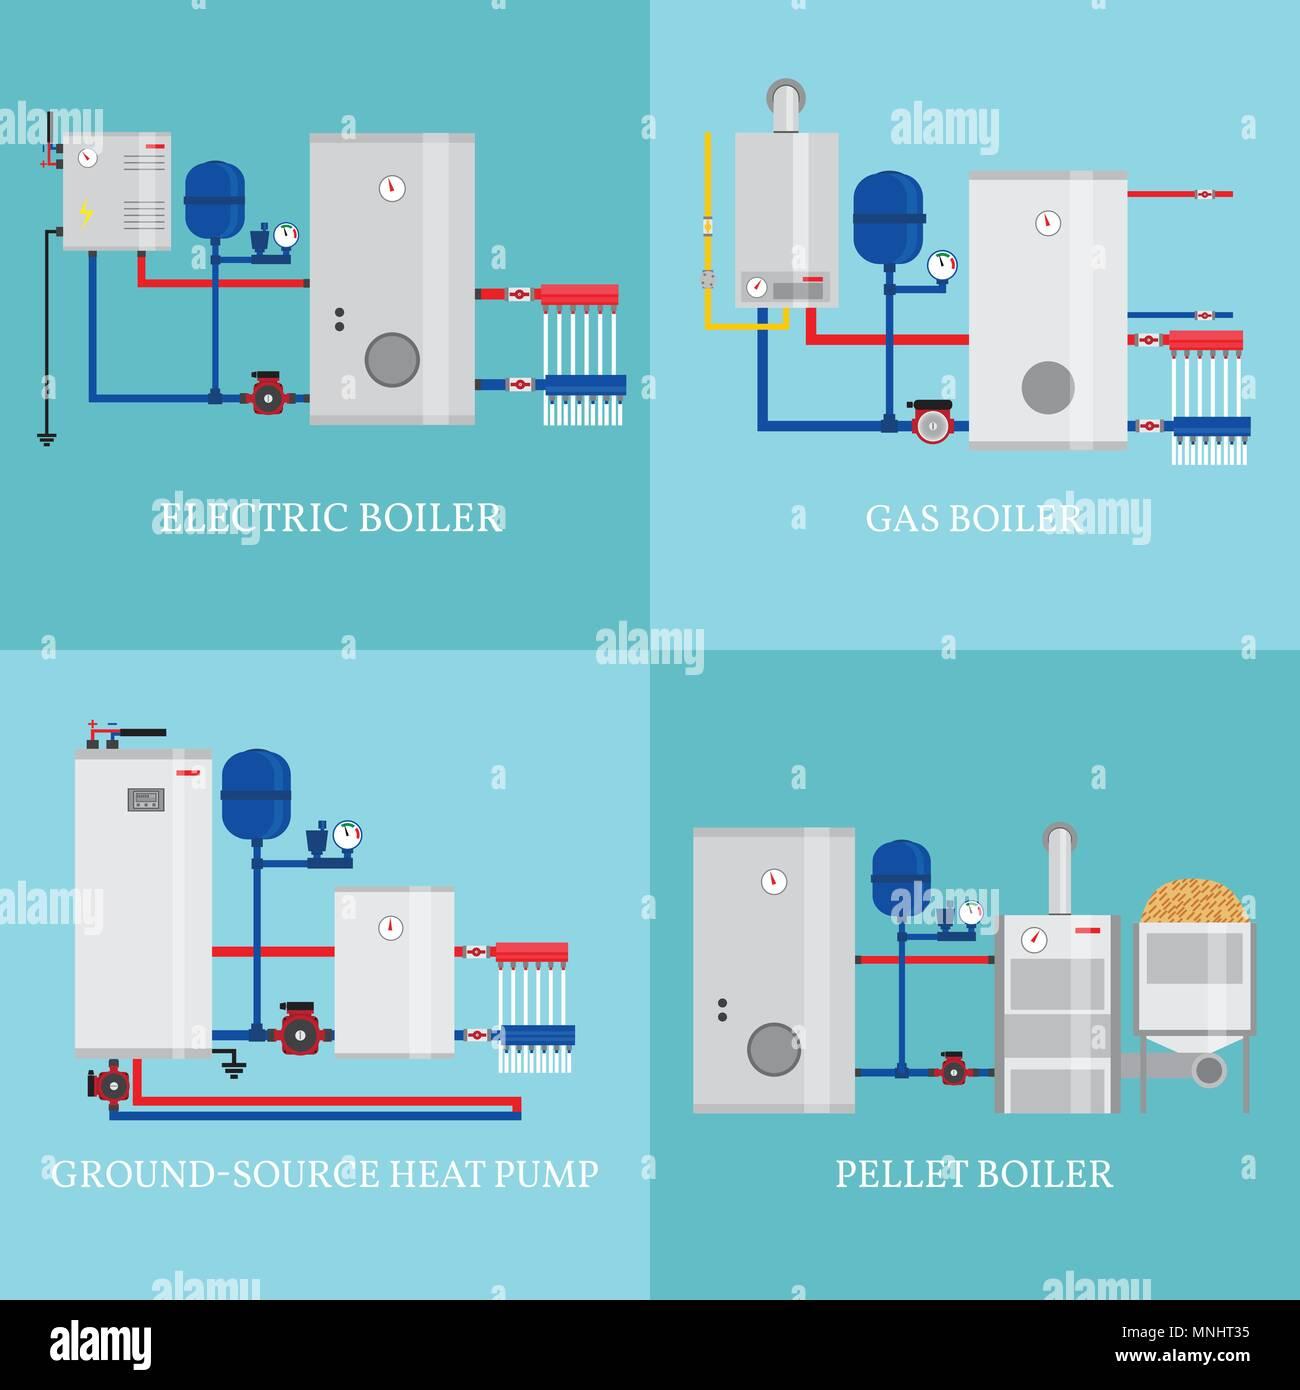 Tipos de calefaccion electrica best images about on - Tipos de calefaccion economica ...